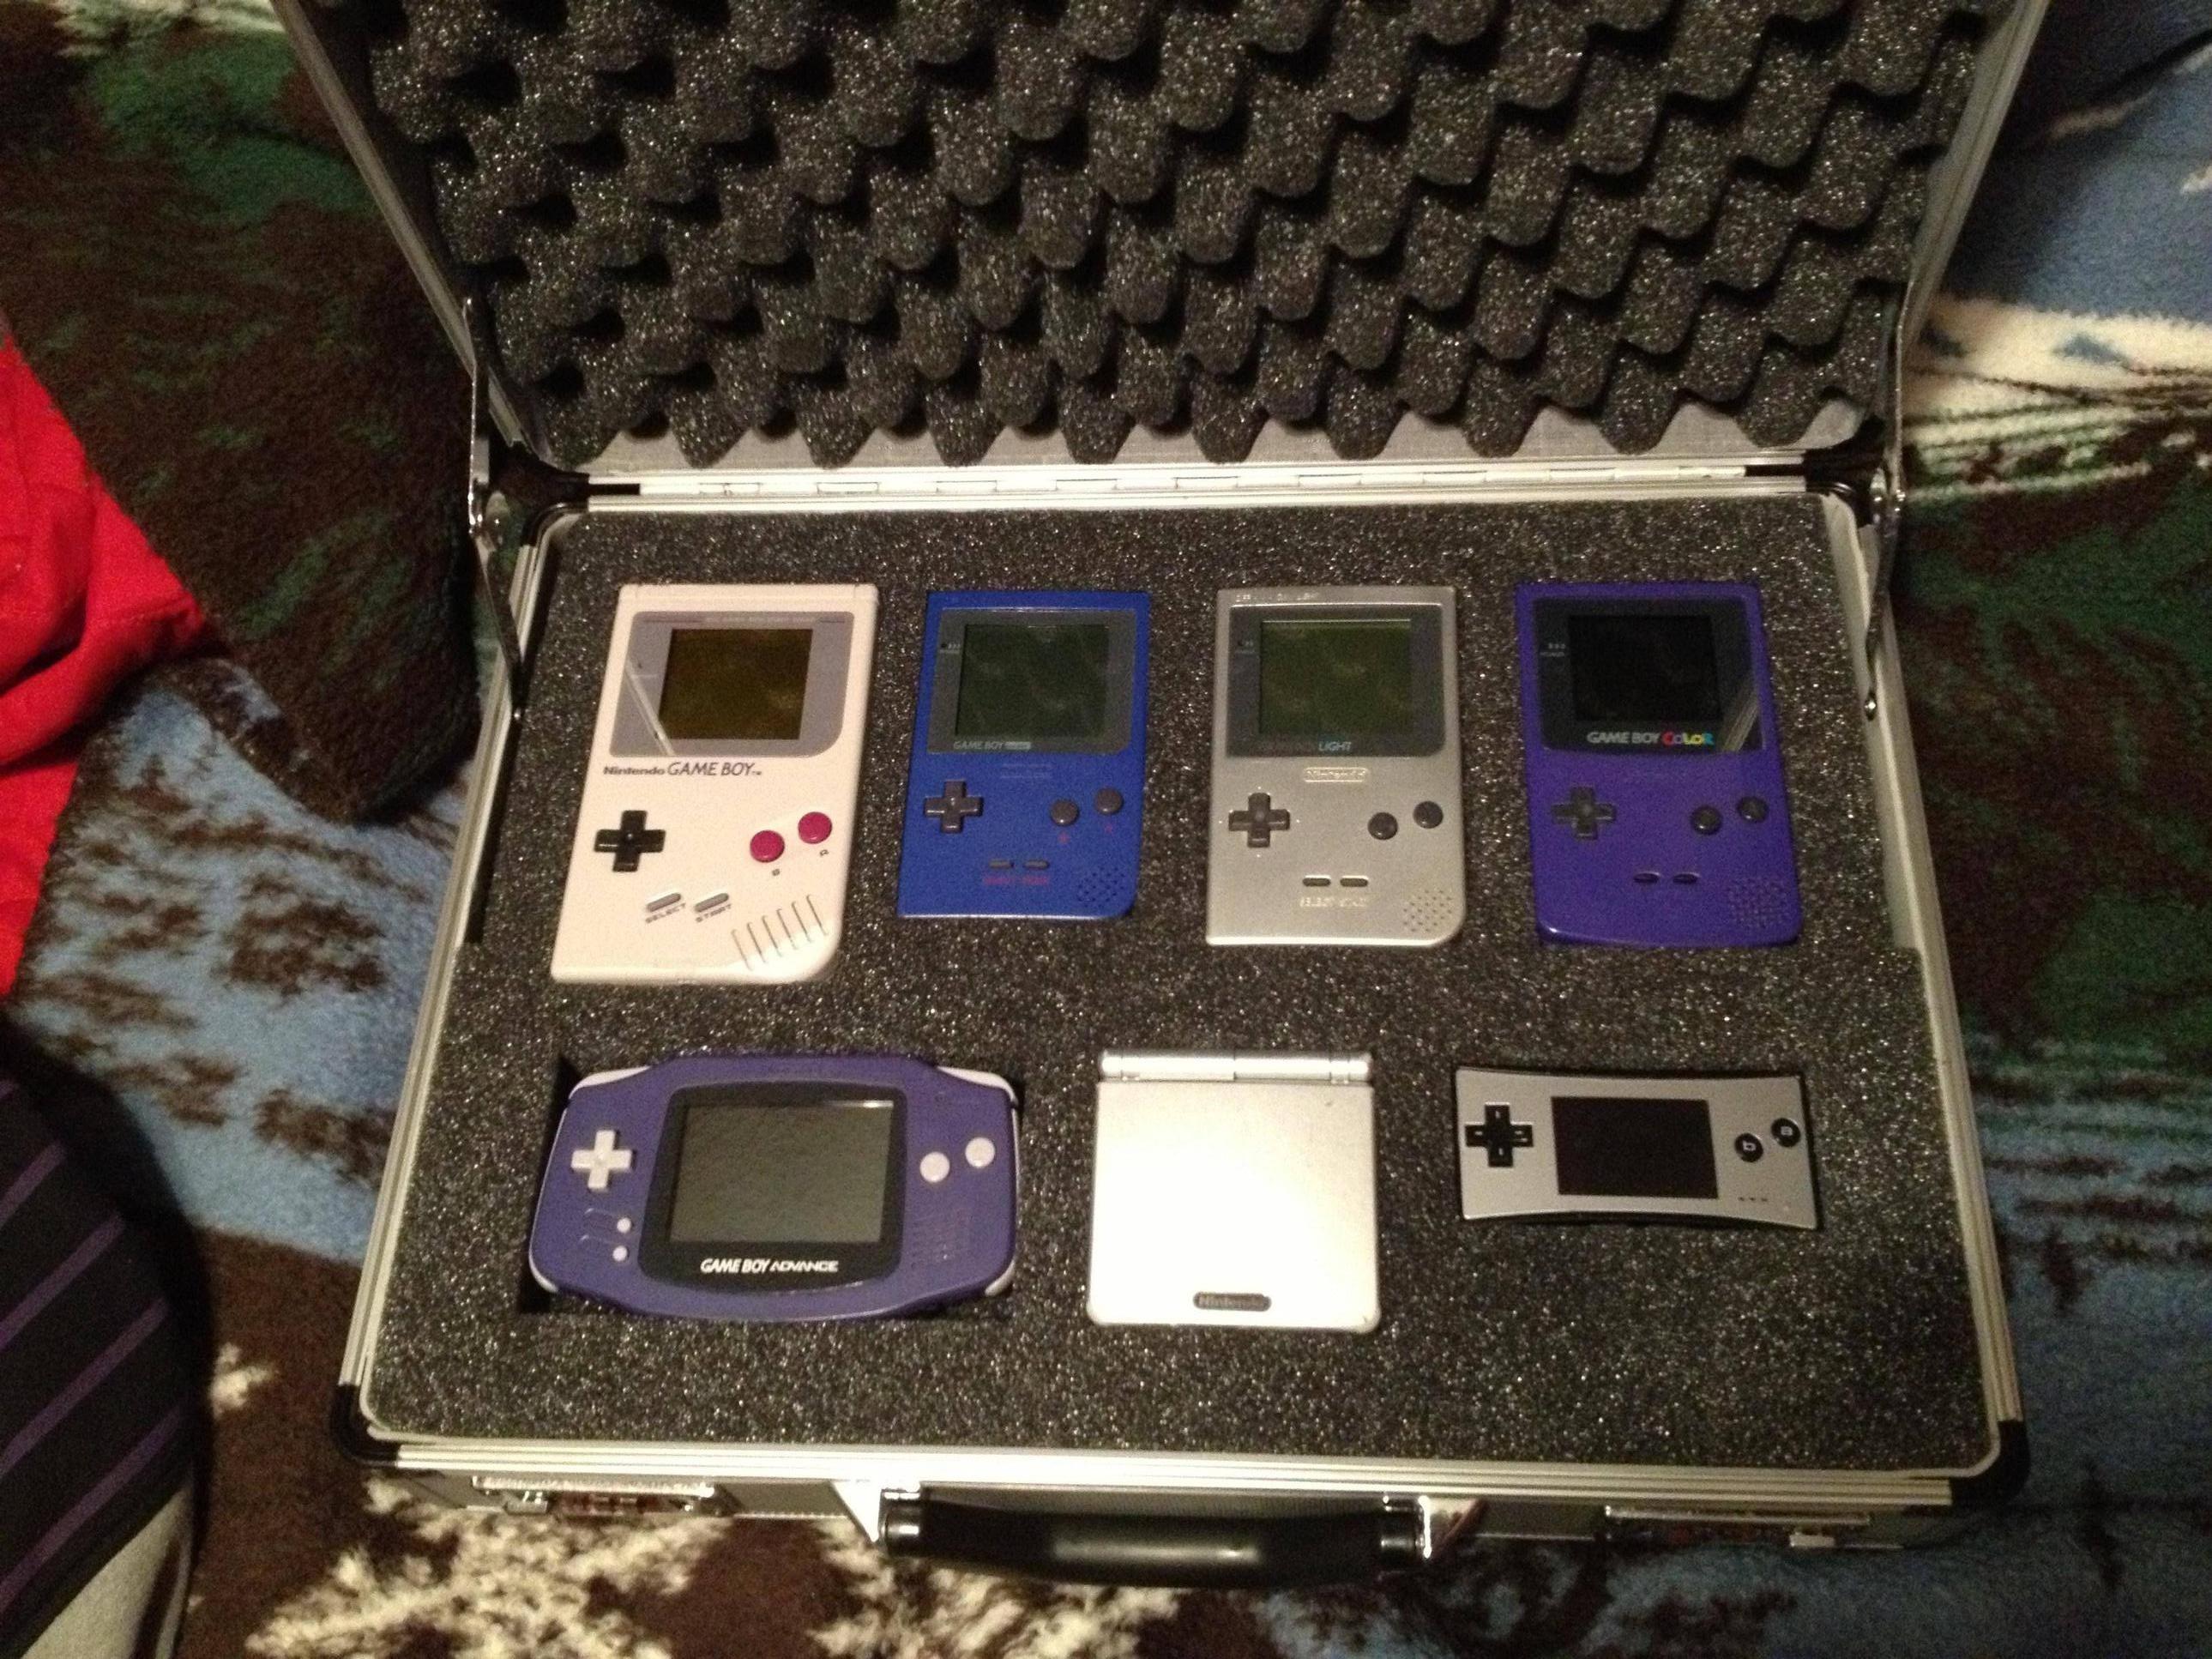 Game boy color palette gimp - Game Boy Color Palette Gimp 30